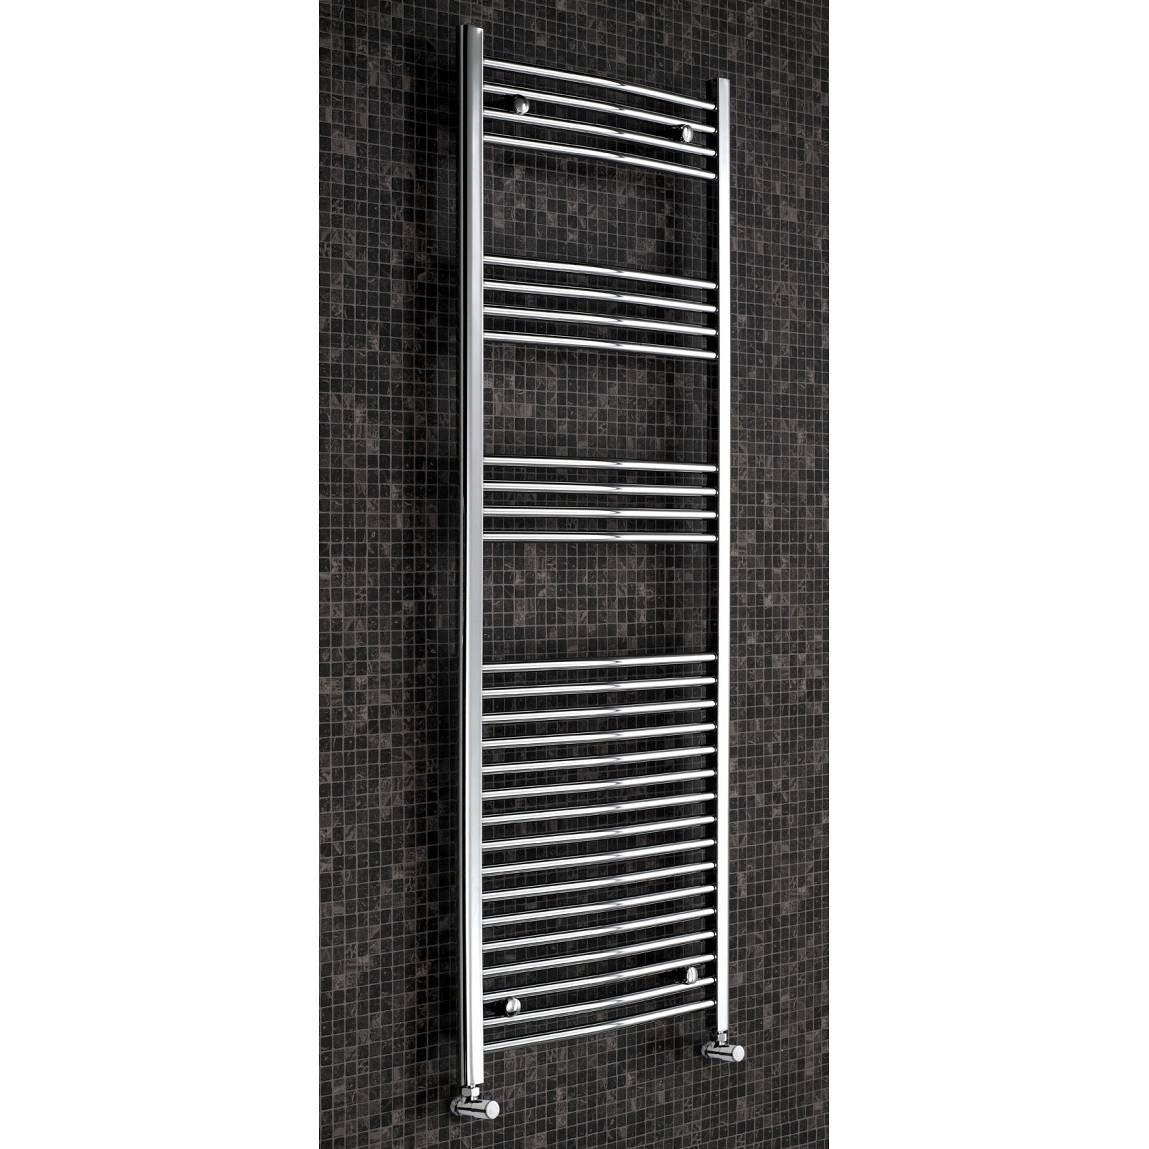 Curved heated towel rail Curved heated towel